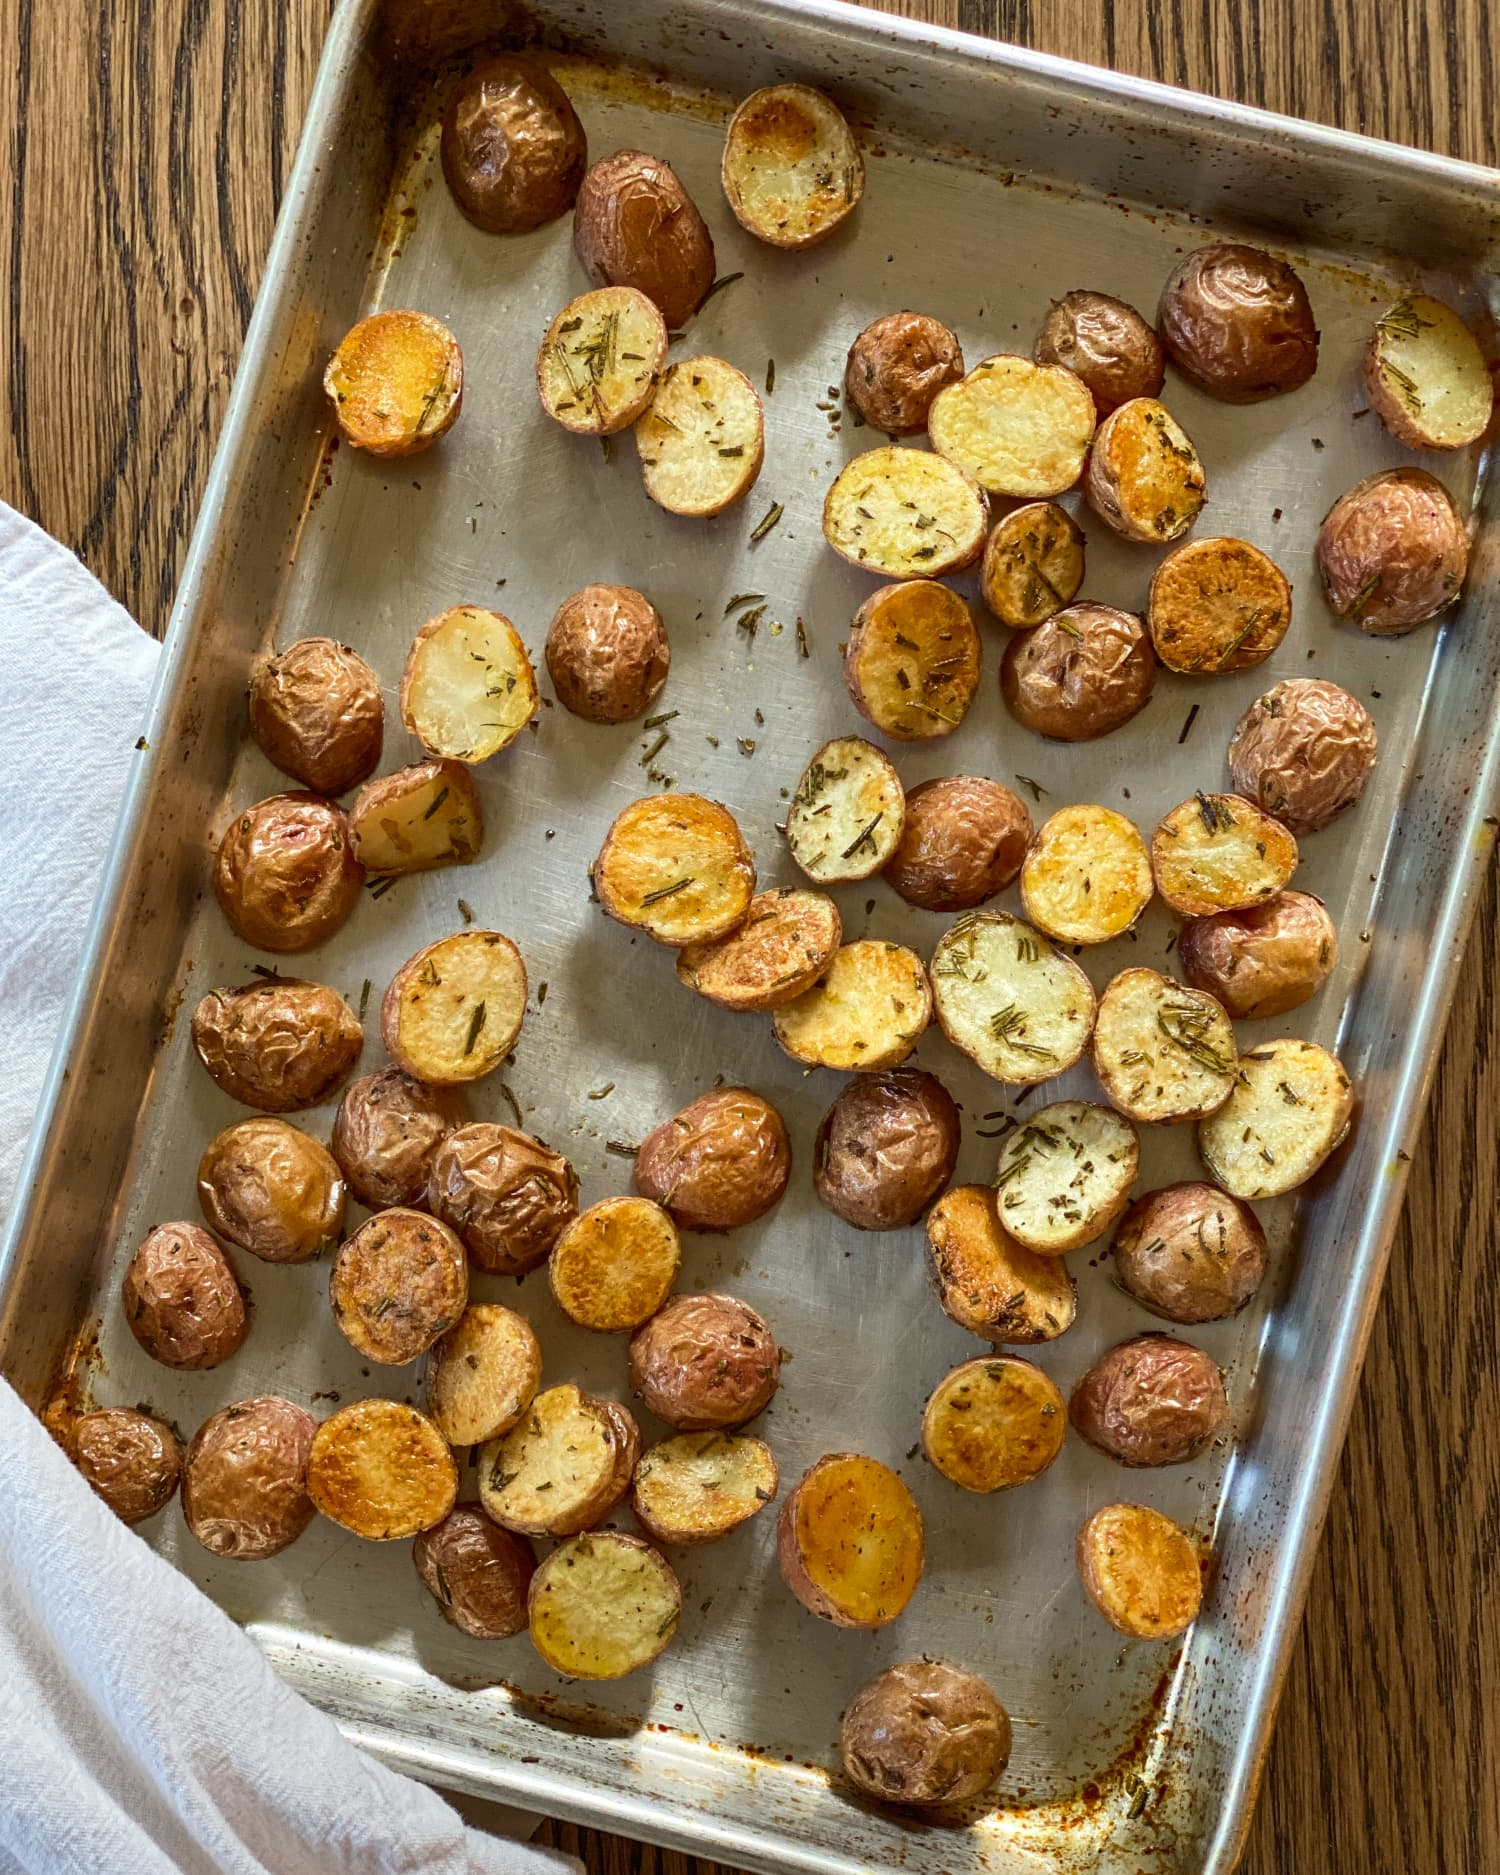 John Legend's Secret to Super-Crispy Roasted Potatoes